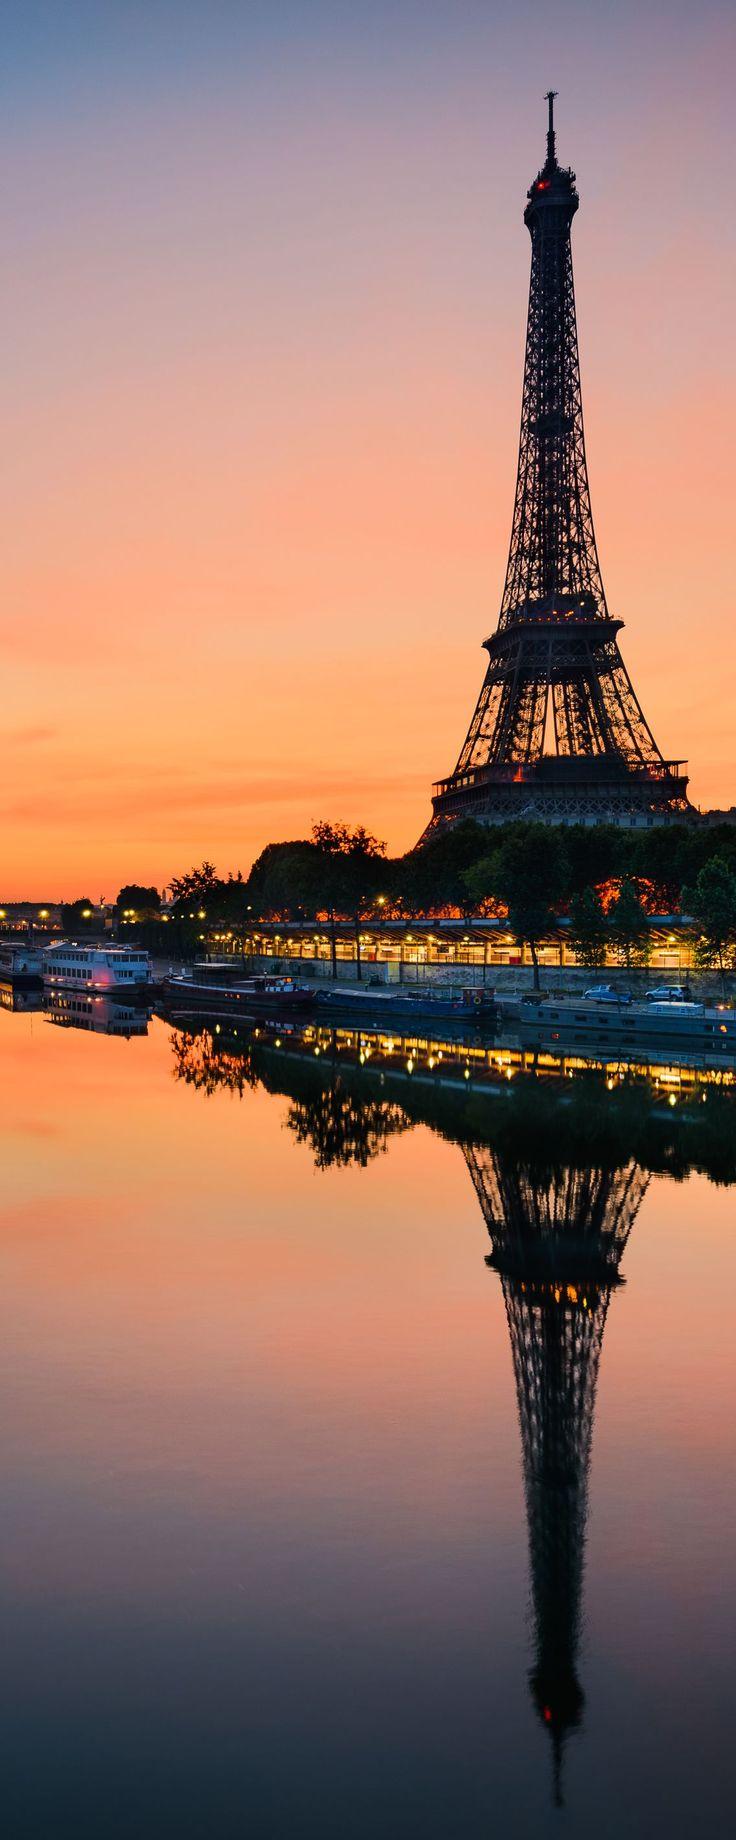 10 Breathtaking European Cities to Visit Before You Die